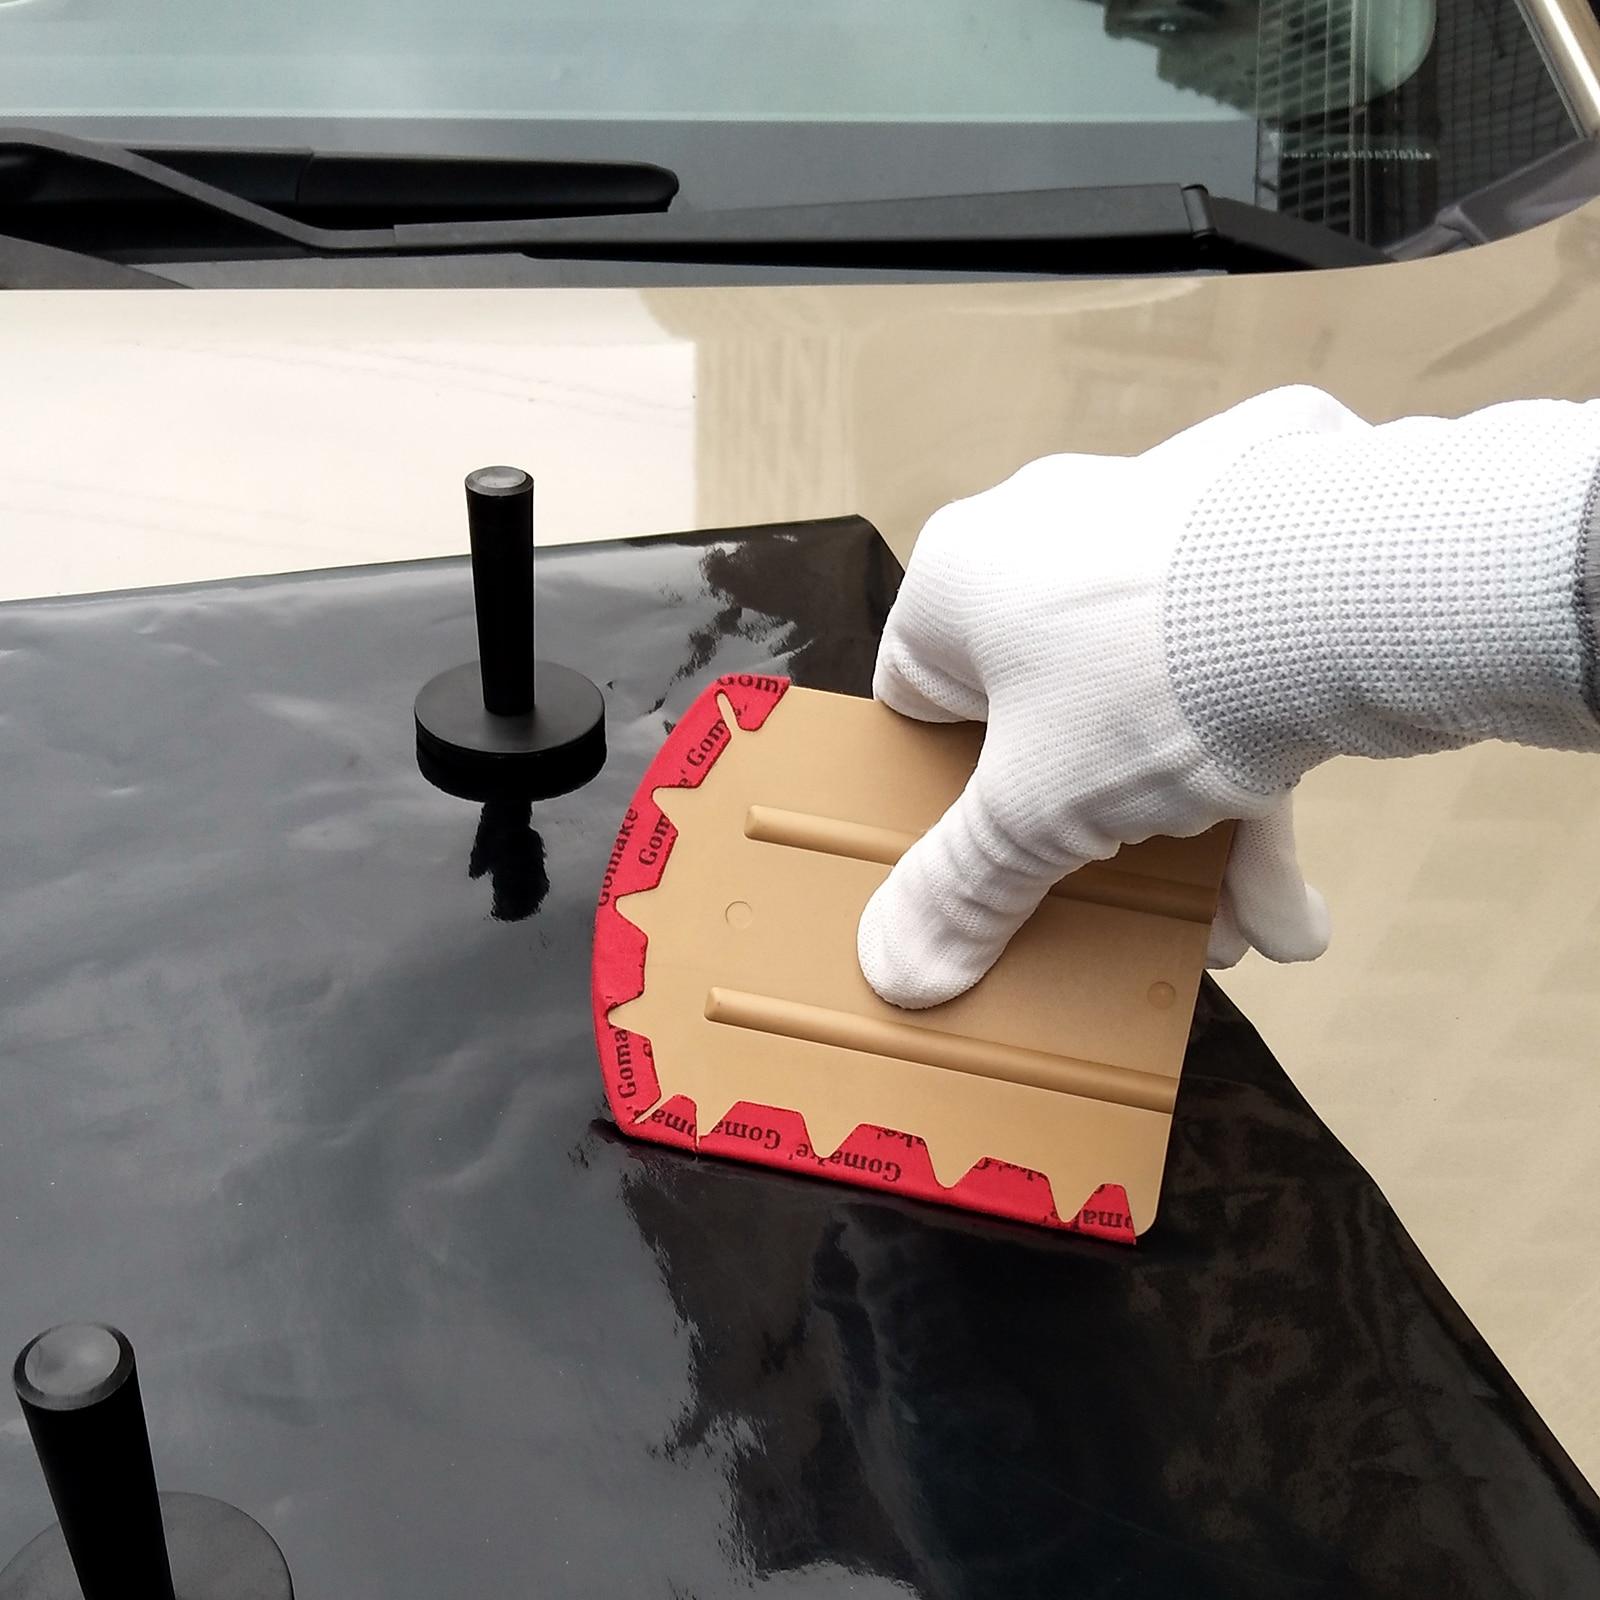 EHDIS Car Wrap Vinyl Microfiber Felt Squeegee Carbon Fiber Foil Film Car Wrapping Scraper Auto Sticker Glue Remover Accessories